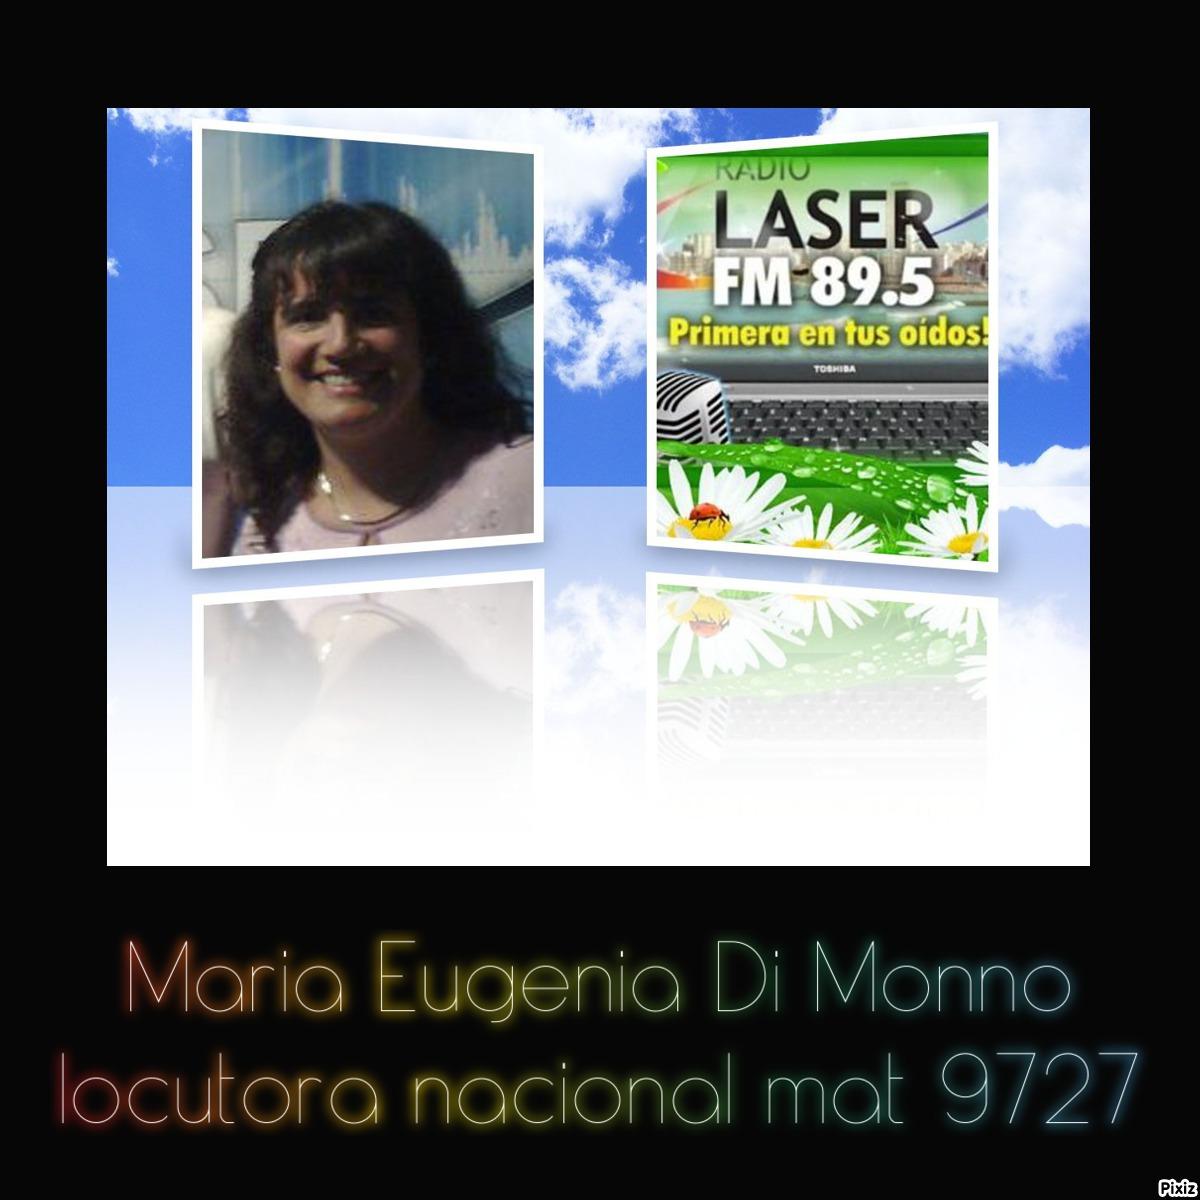 La mañana de Radio Laser